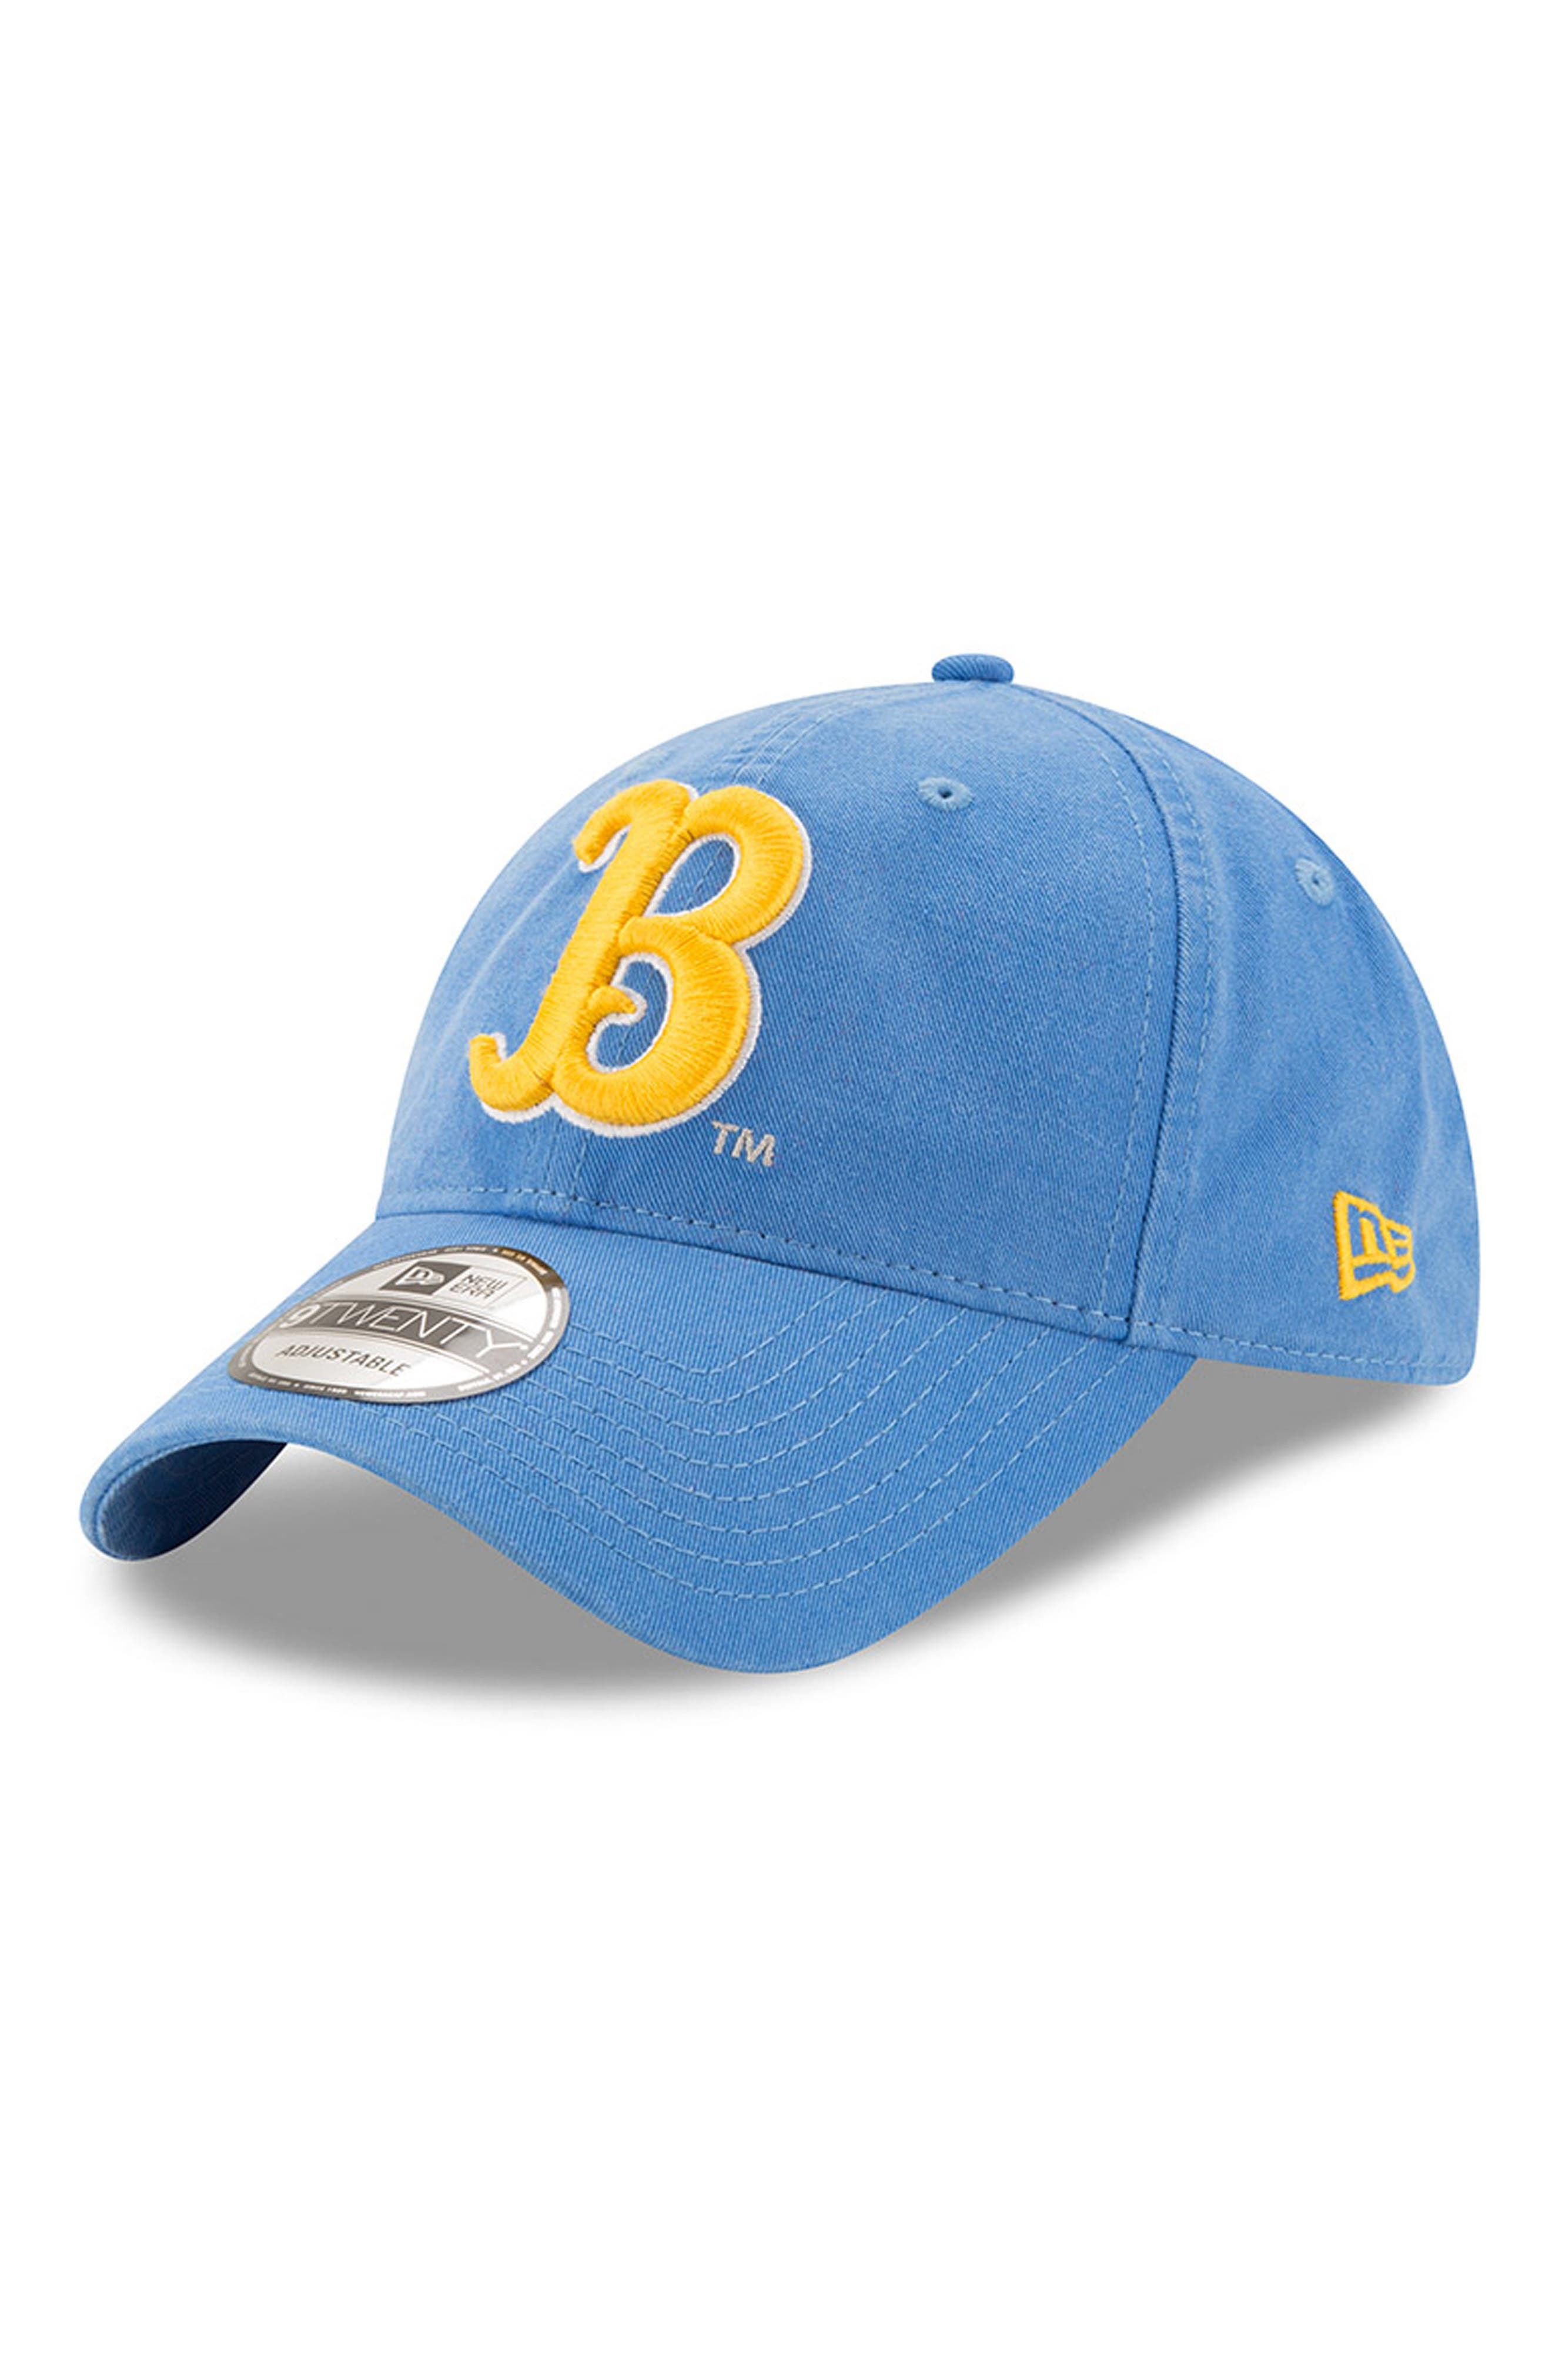 New Era Collegiate Core Classic - UCLA Bruins Baseball Cap,                             Main thumbnail 1, color,                             420